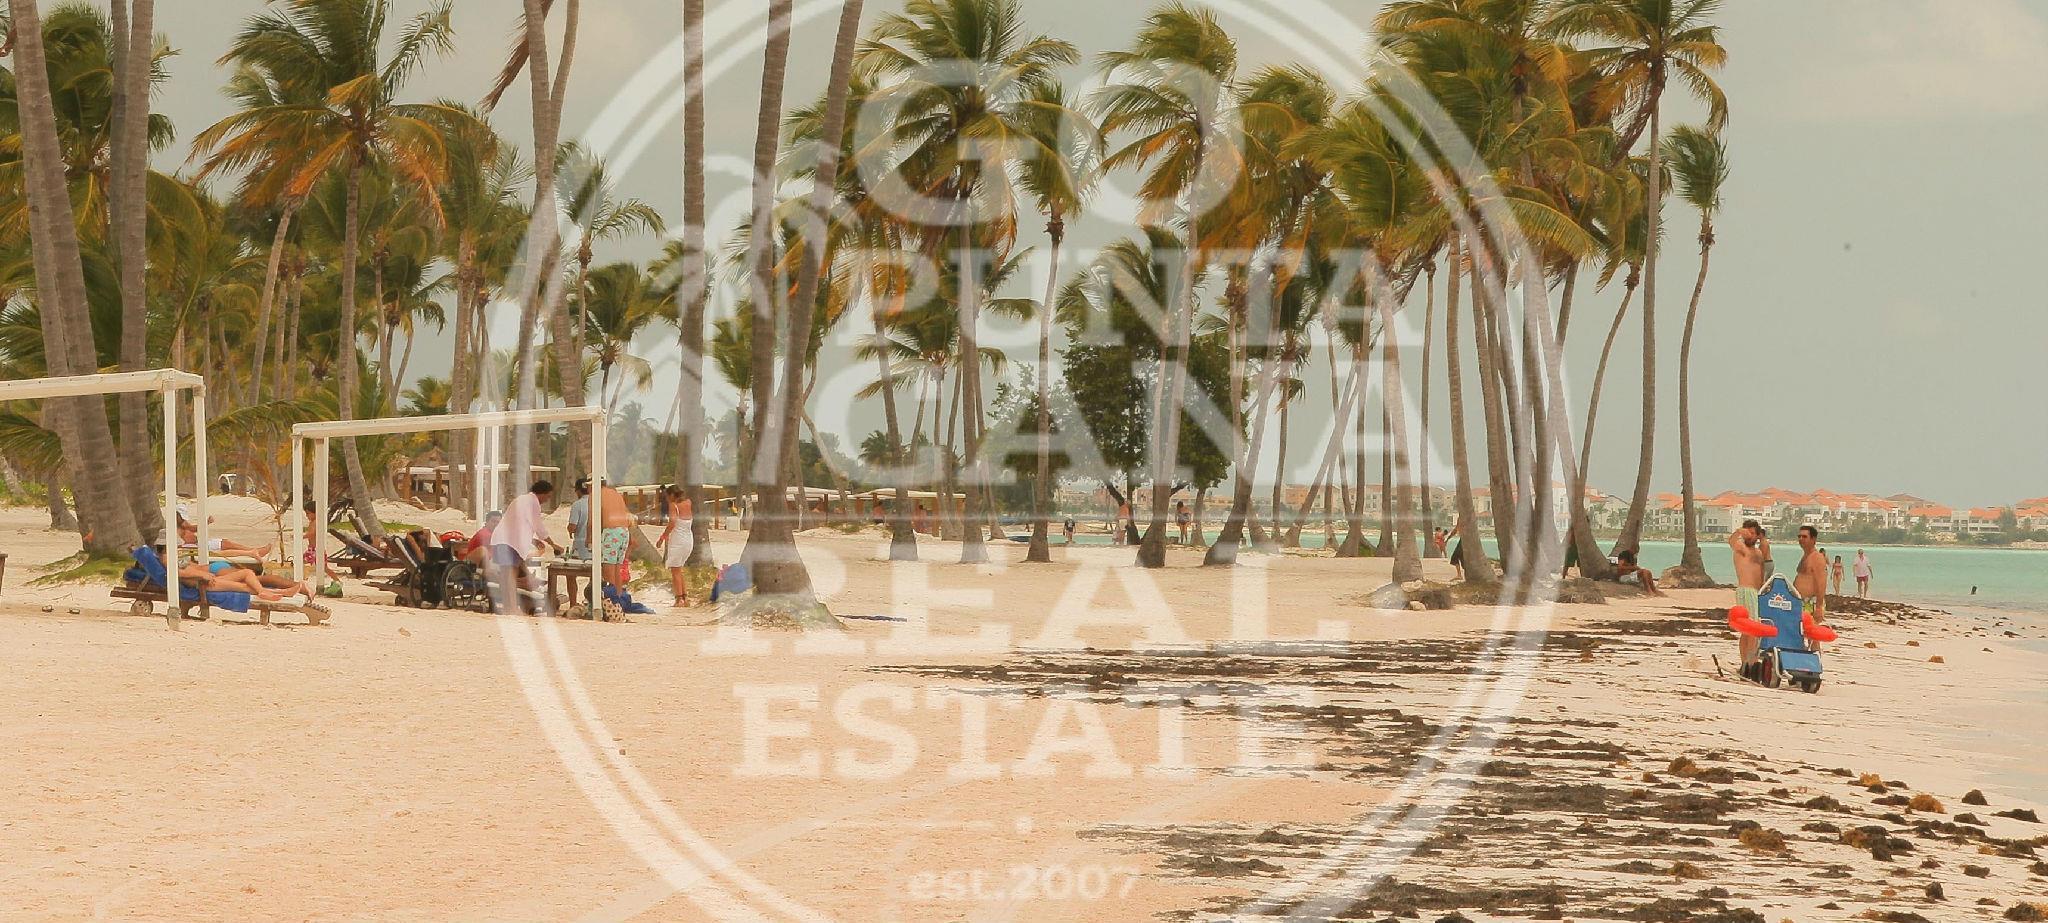 Blurred background image #85